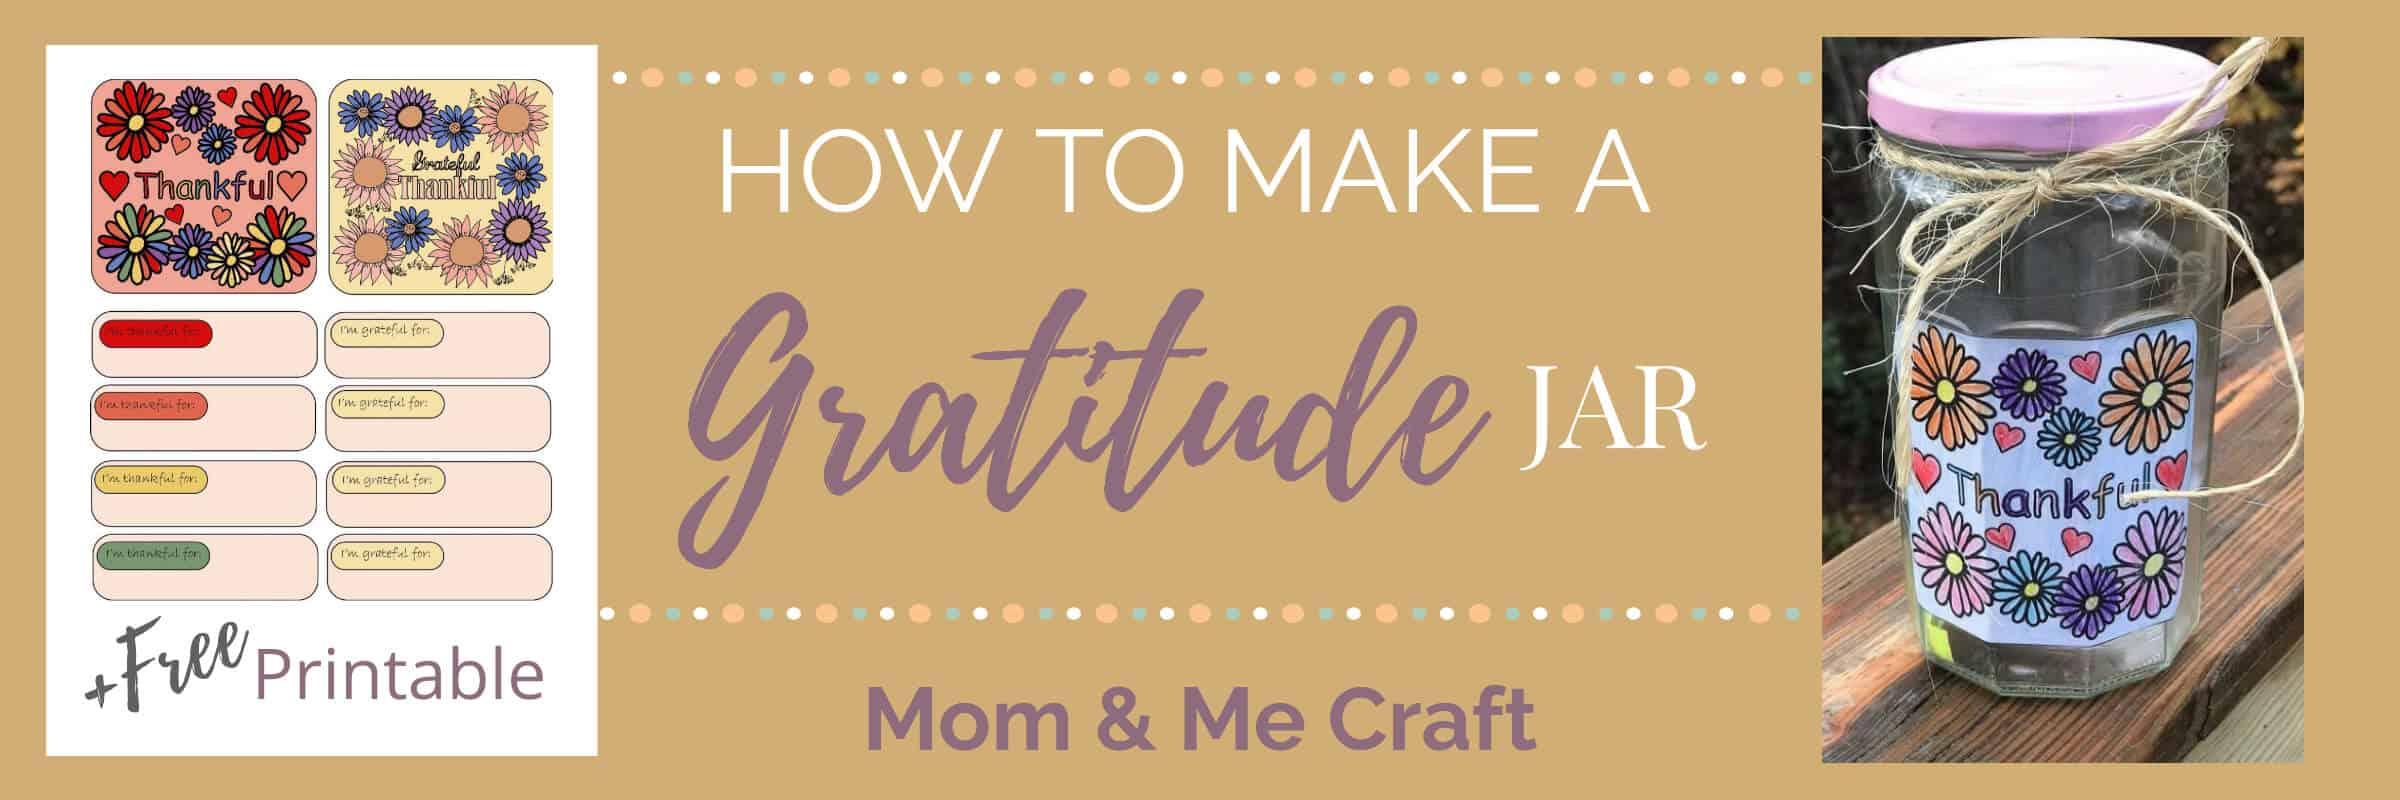 How to Make a Gratitude Jar Mom and Me Craft and Printable